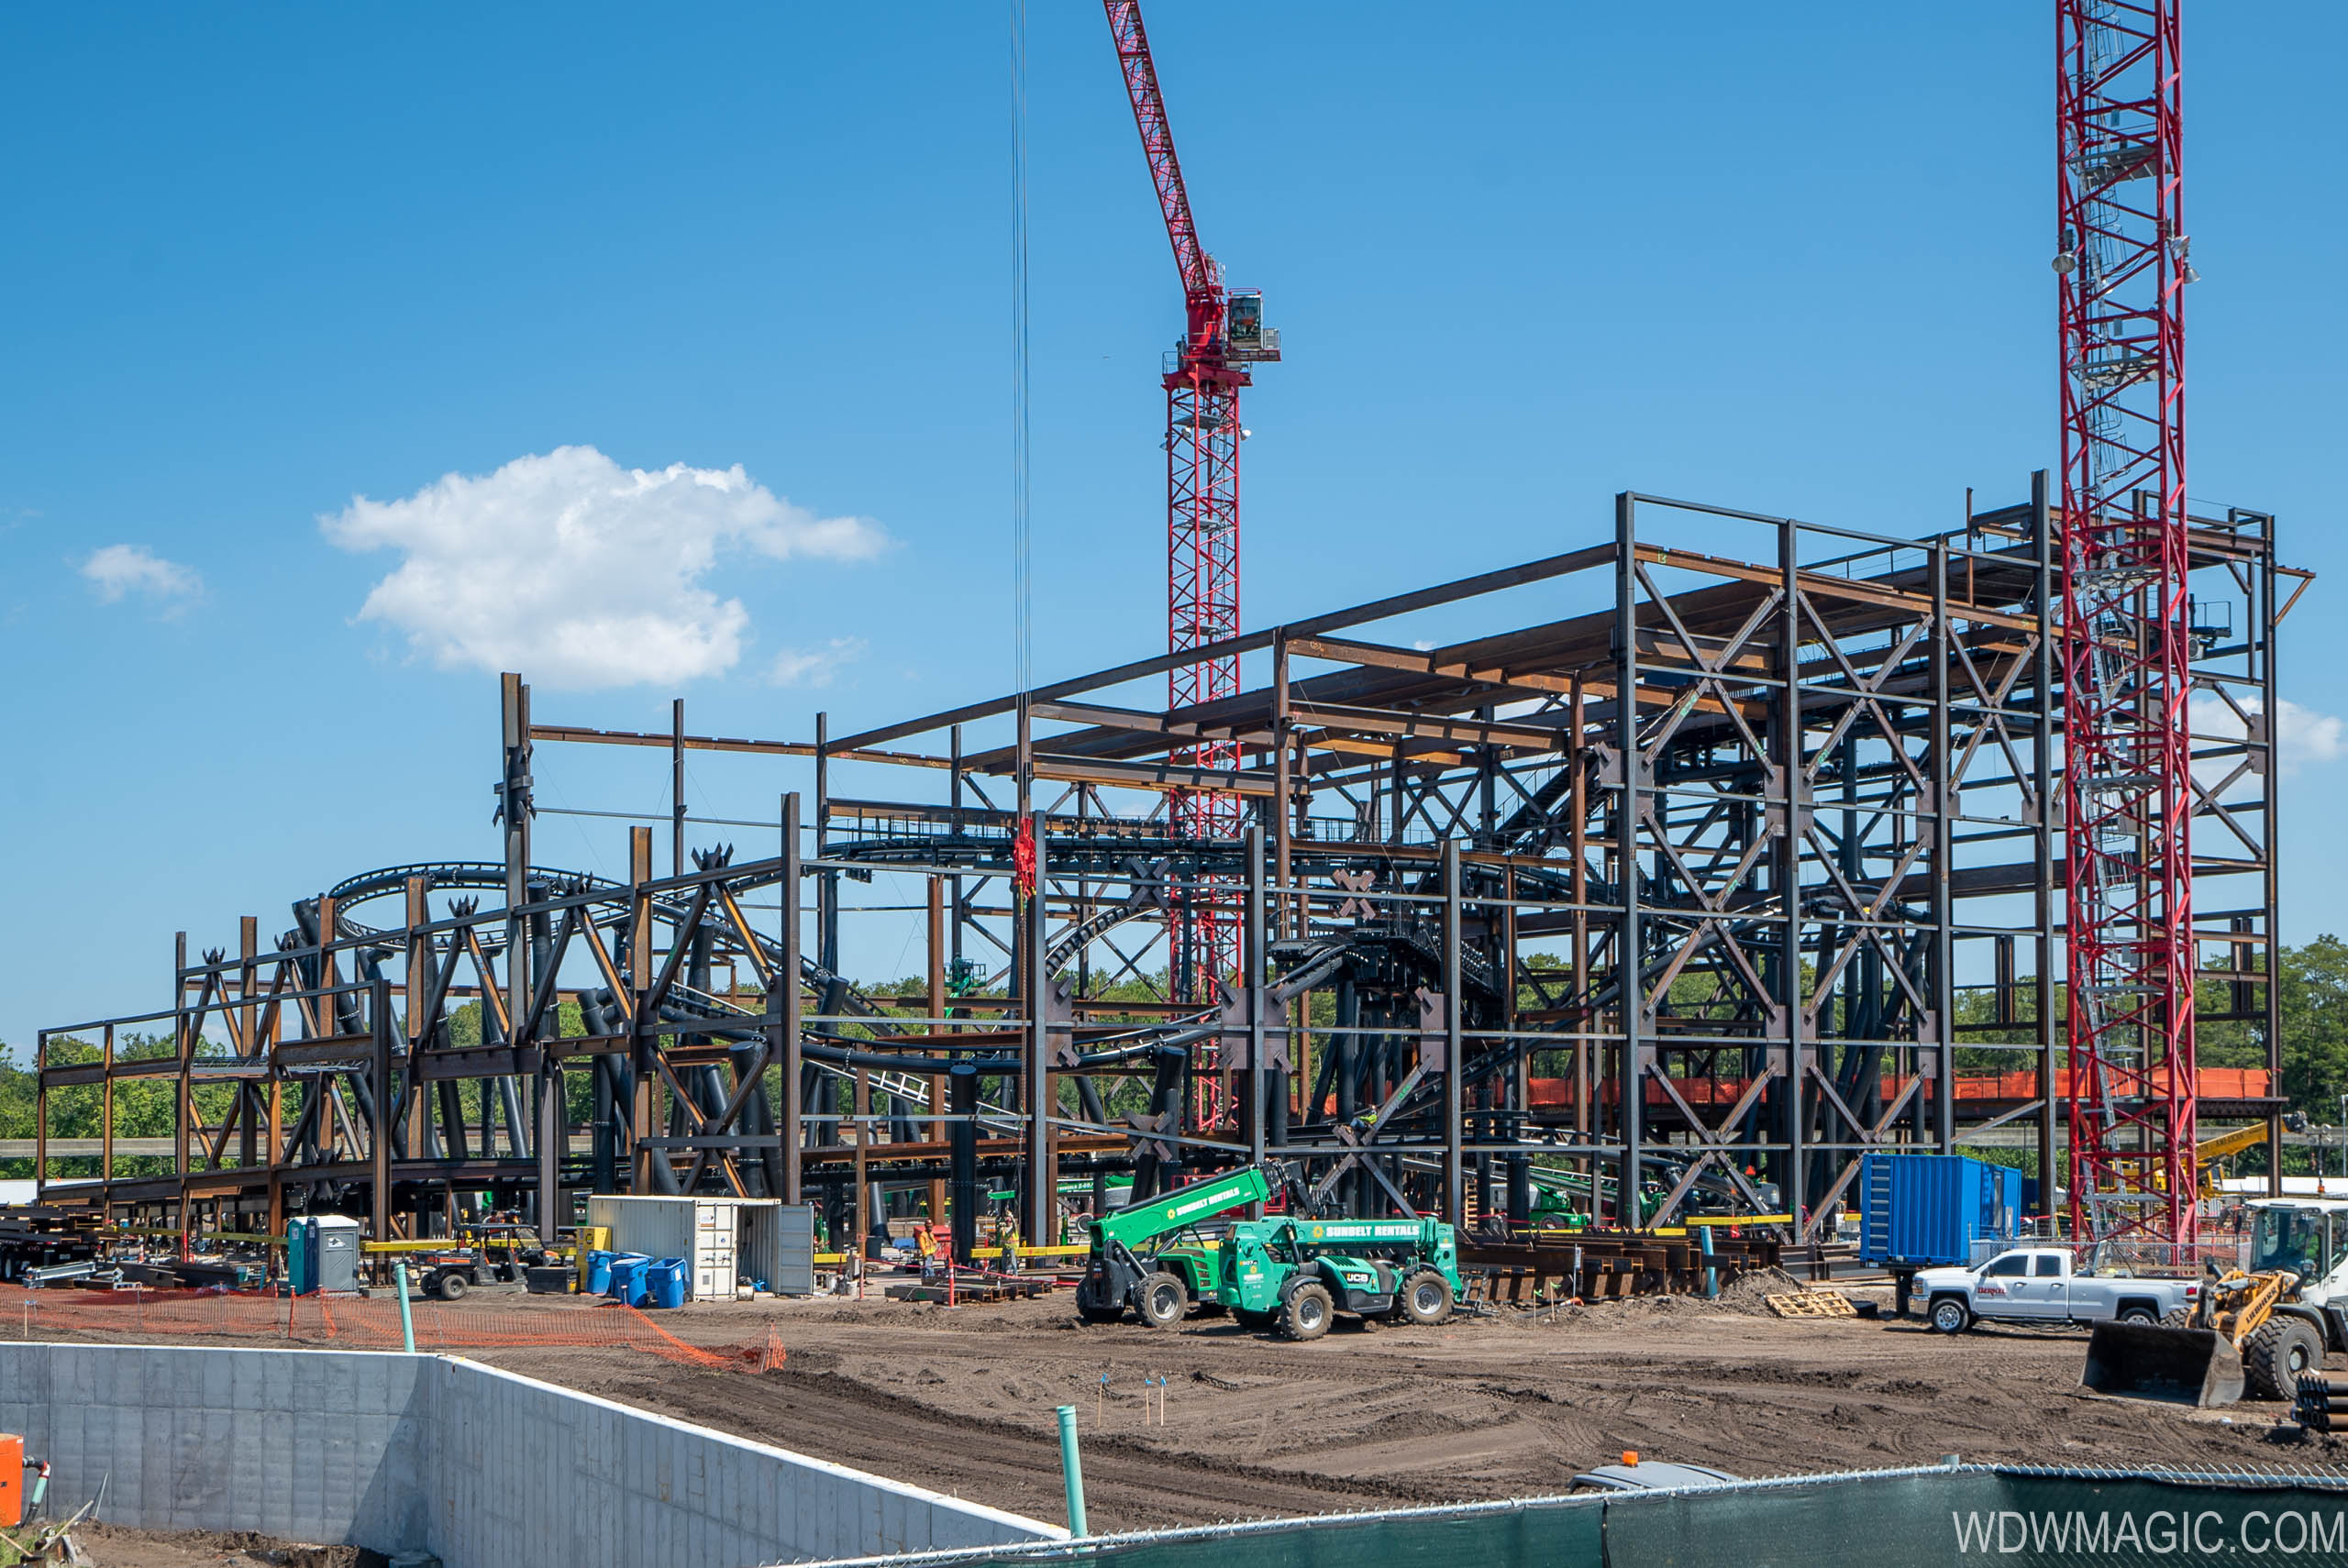 TRON Lightcycle Run construction site - September 2019